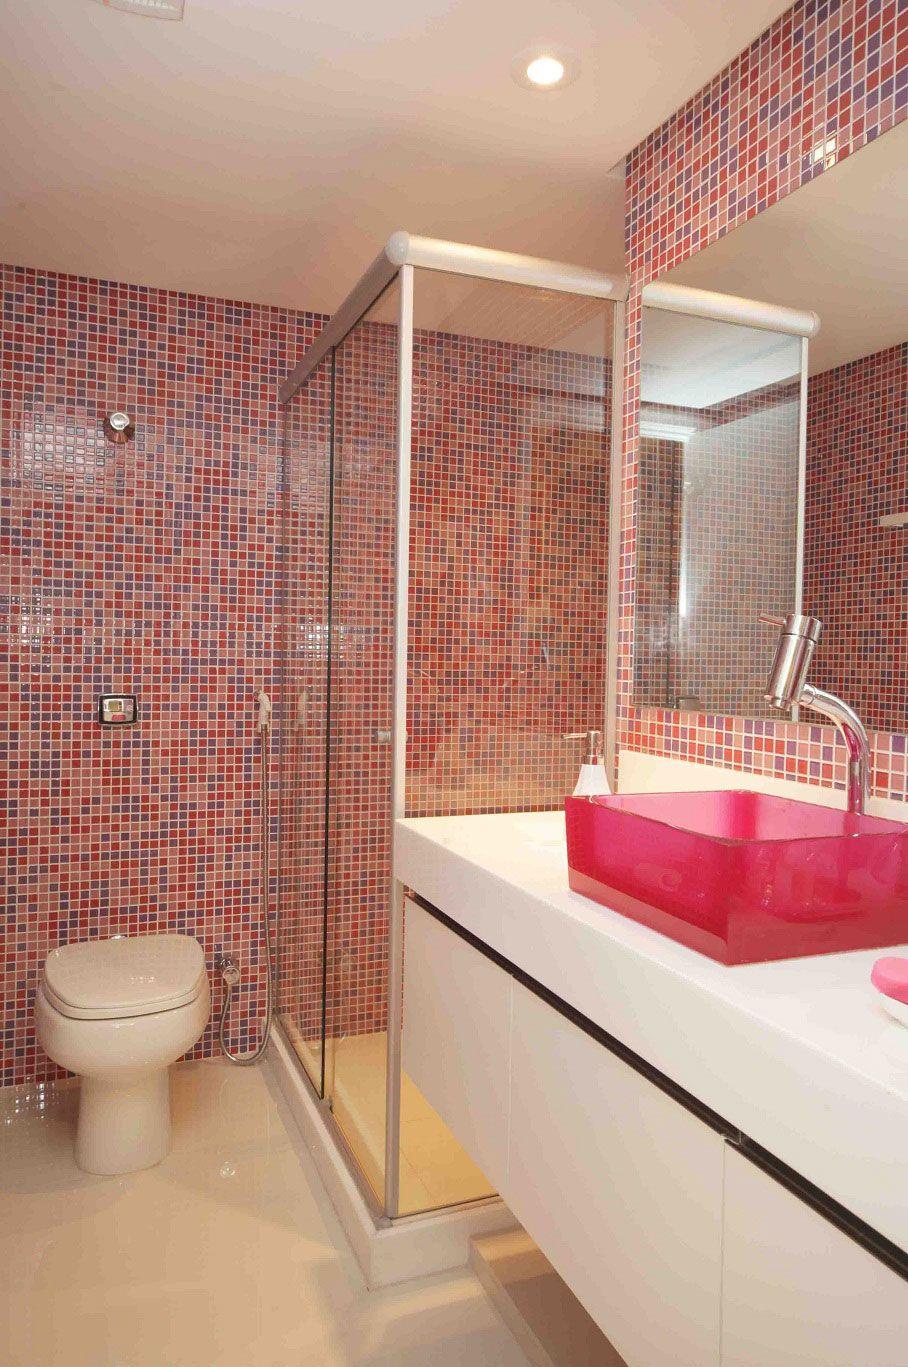 Cuba para Banheiro Tipos, Modelos e 60 Fotos Incríveis! -> Cuba Para Banheiro Triangular